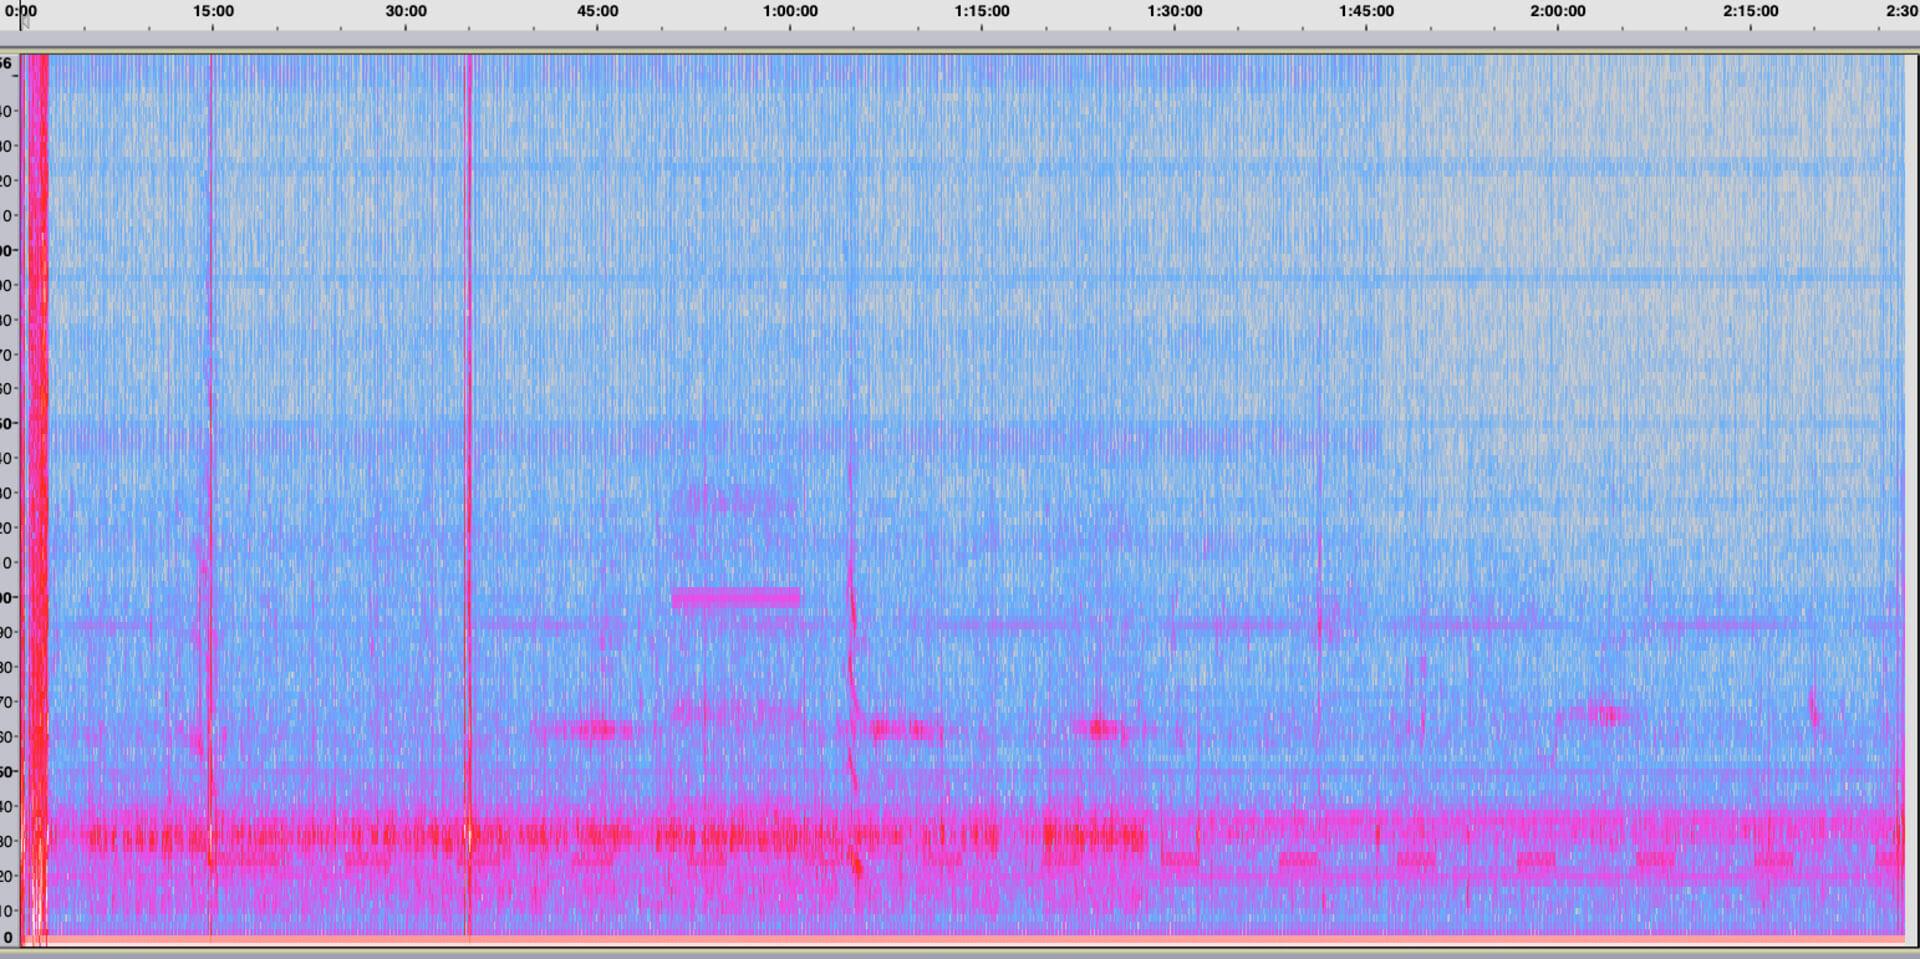 geophone spectrograph